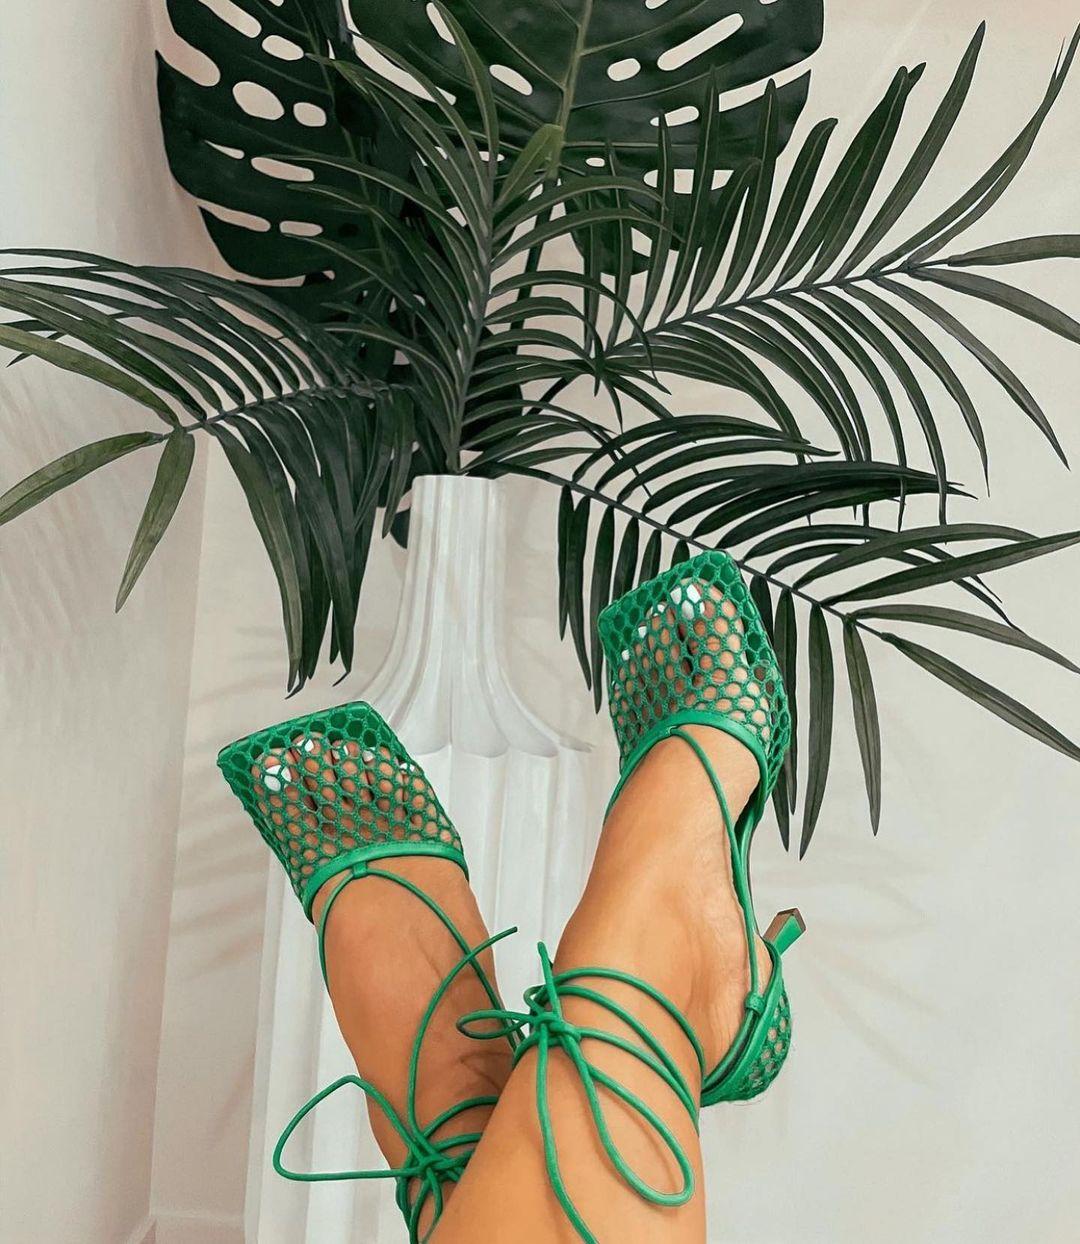 giày xanh lá